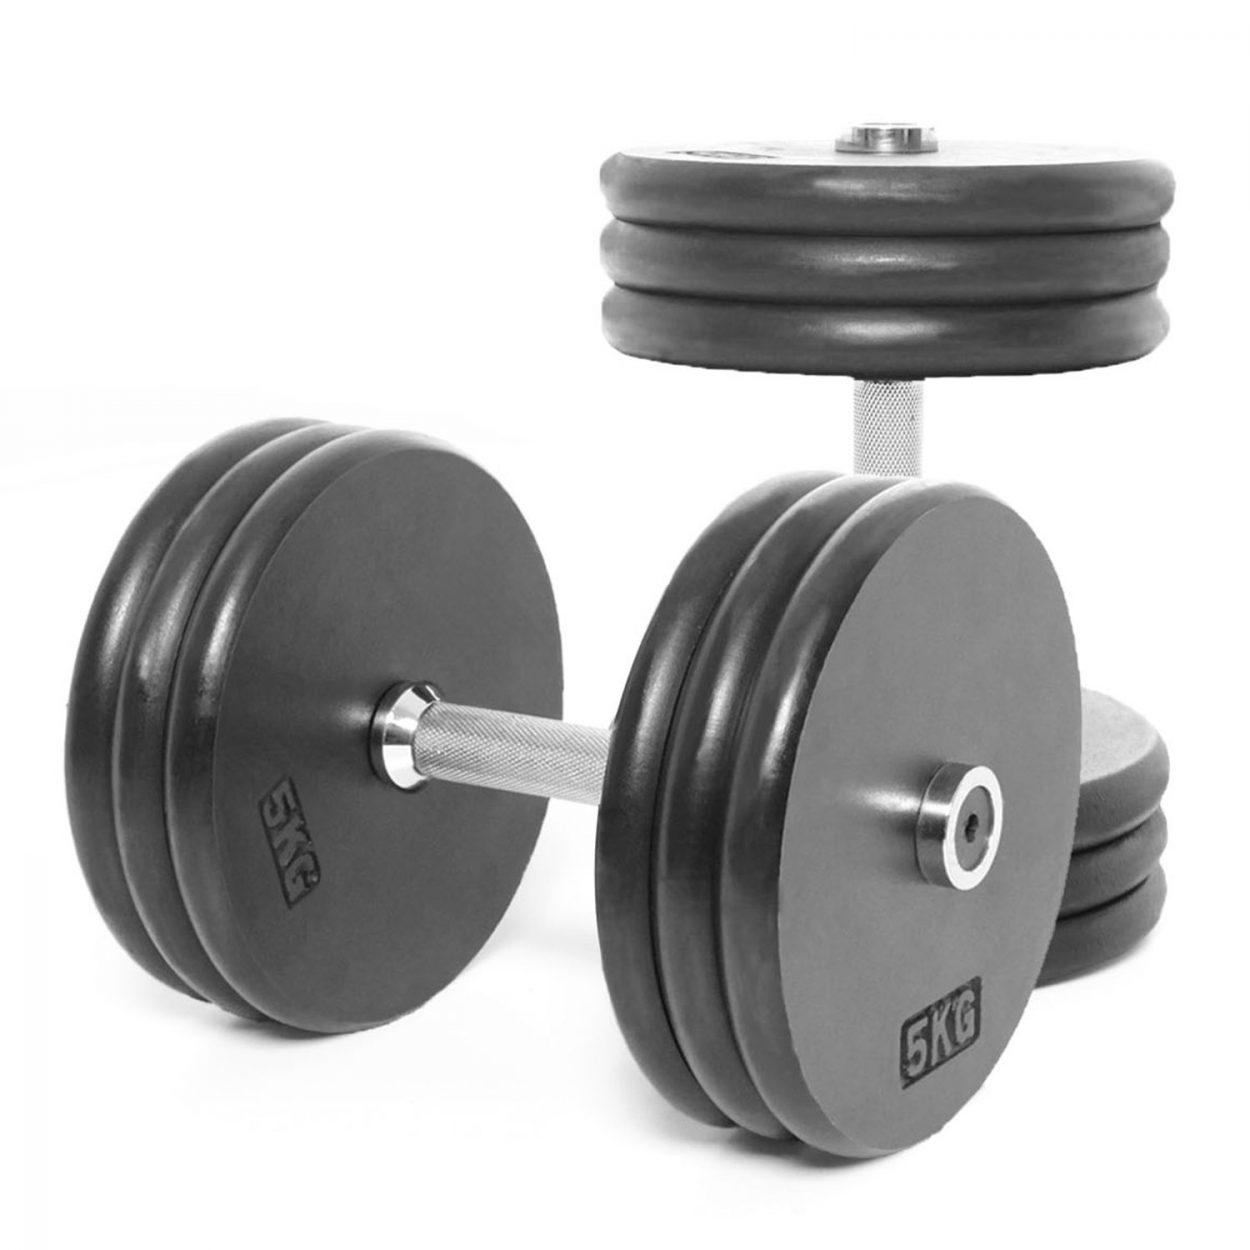 Body Power Pro-style Dumbbells 30kg (x2)